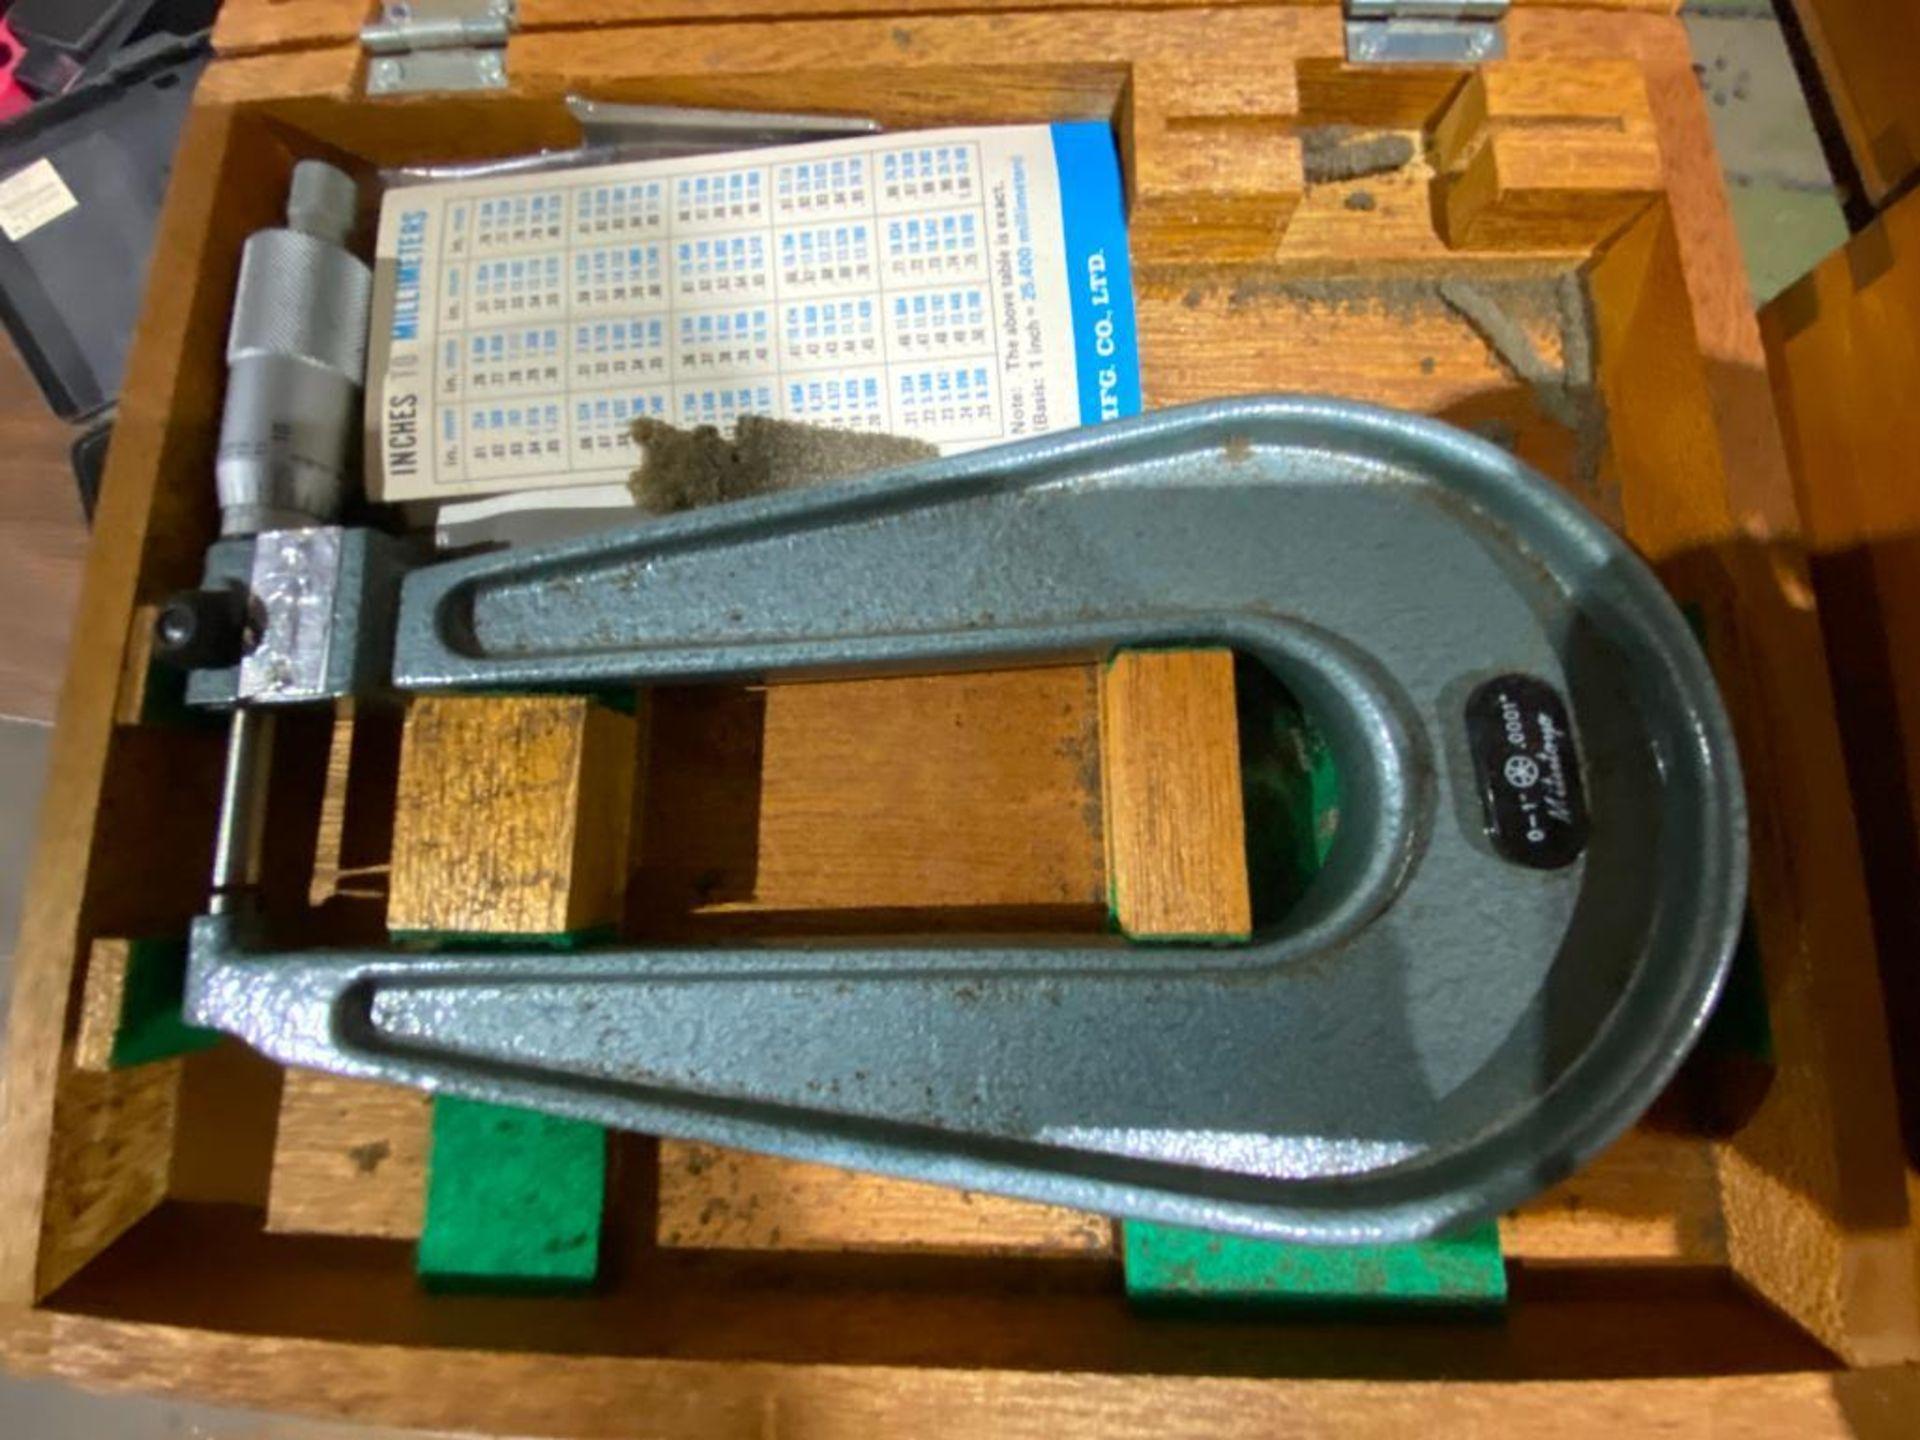 Mitutoyo analog micrometer - Image 2 of 3